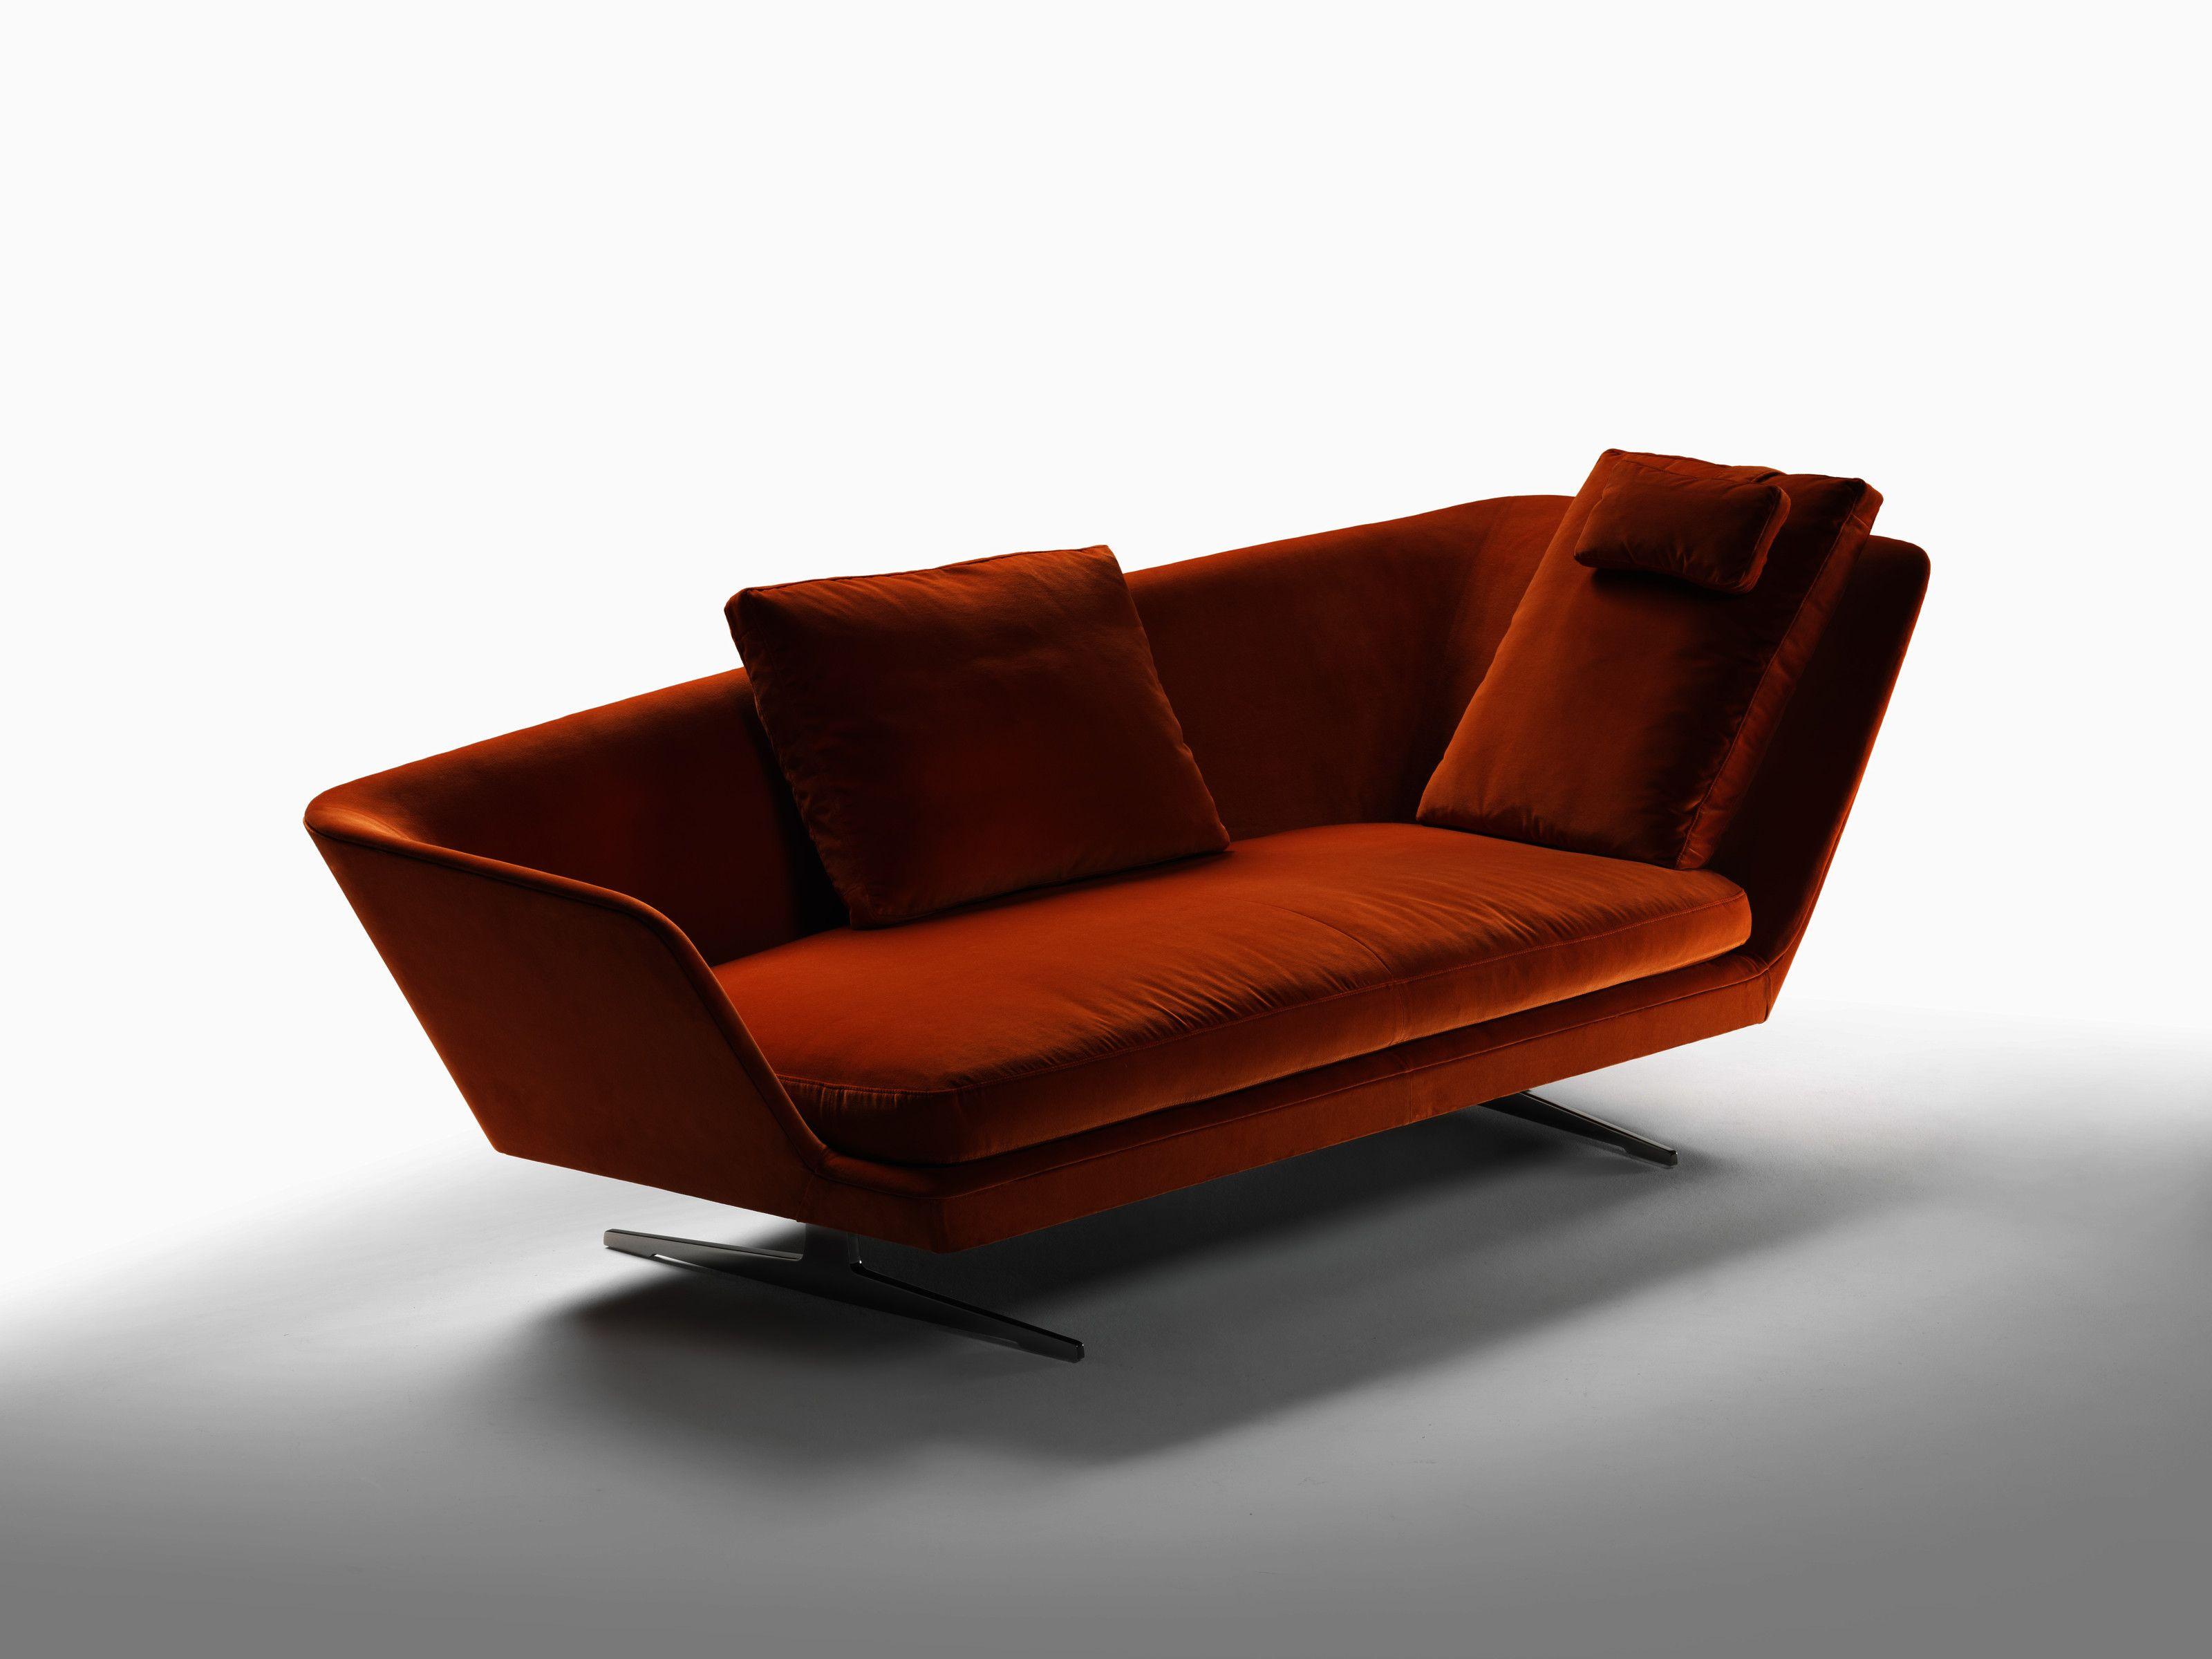 Stay Warm And Cozy This Winter In Our Zeus Sofa Designed By Antonio Citterio #flexformny #chic #elegant #sofa #moderndesign #… | Sofa Styling, Flexform, Sofa Design